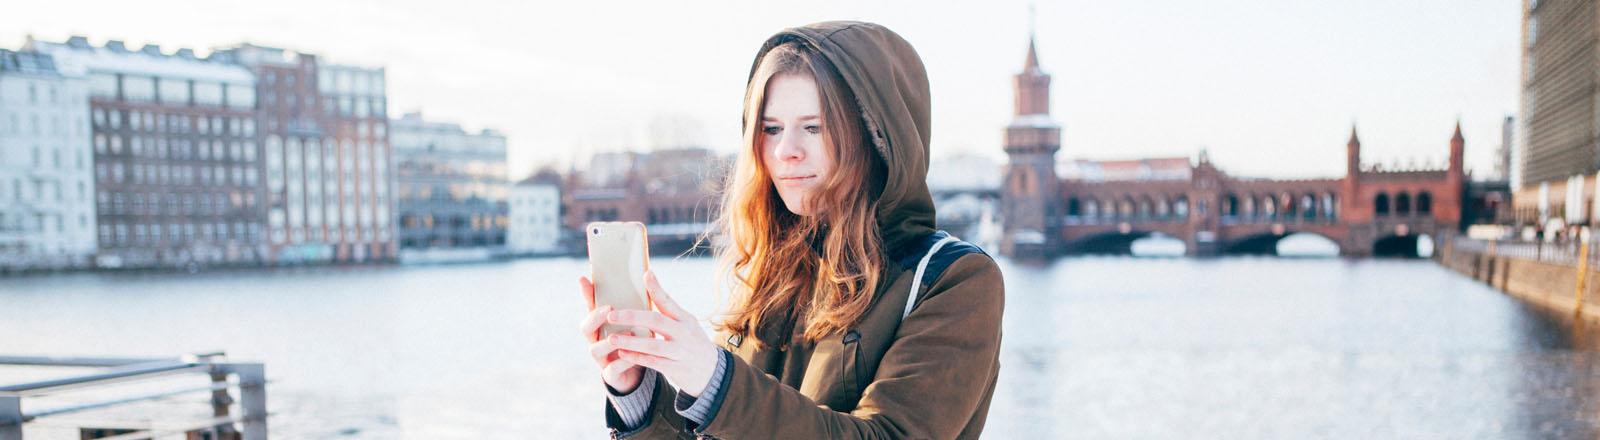 Frau macht Selfie vor Oberbaumbrücke in Berlin